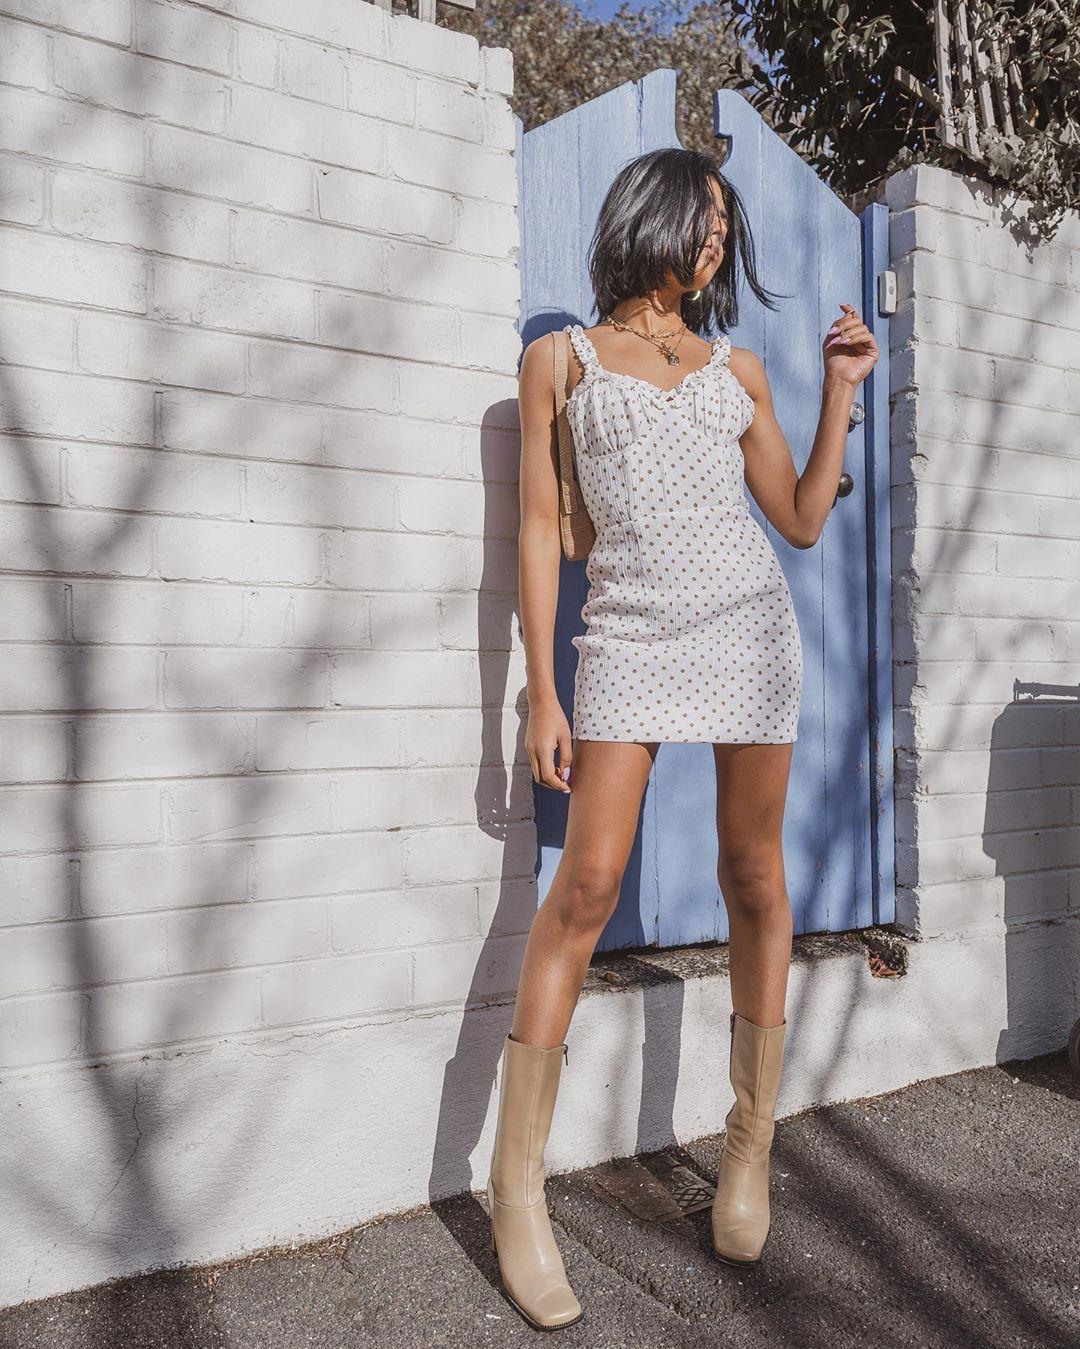 dress white dress mini skirt polka dots sleeveless dress knee high boots